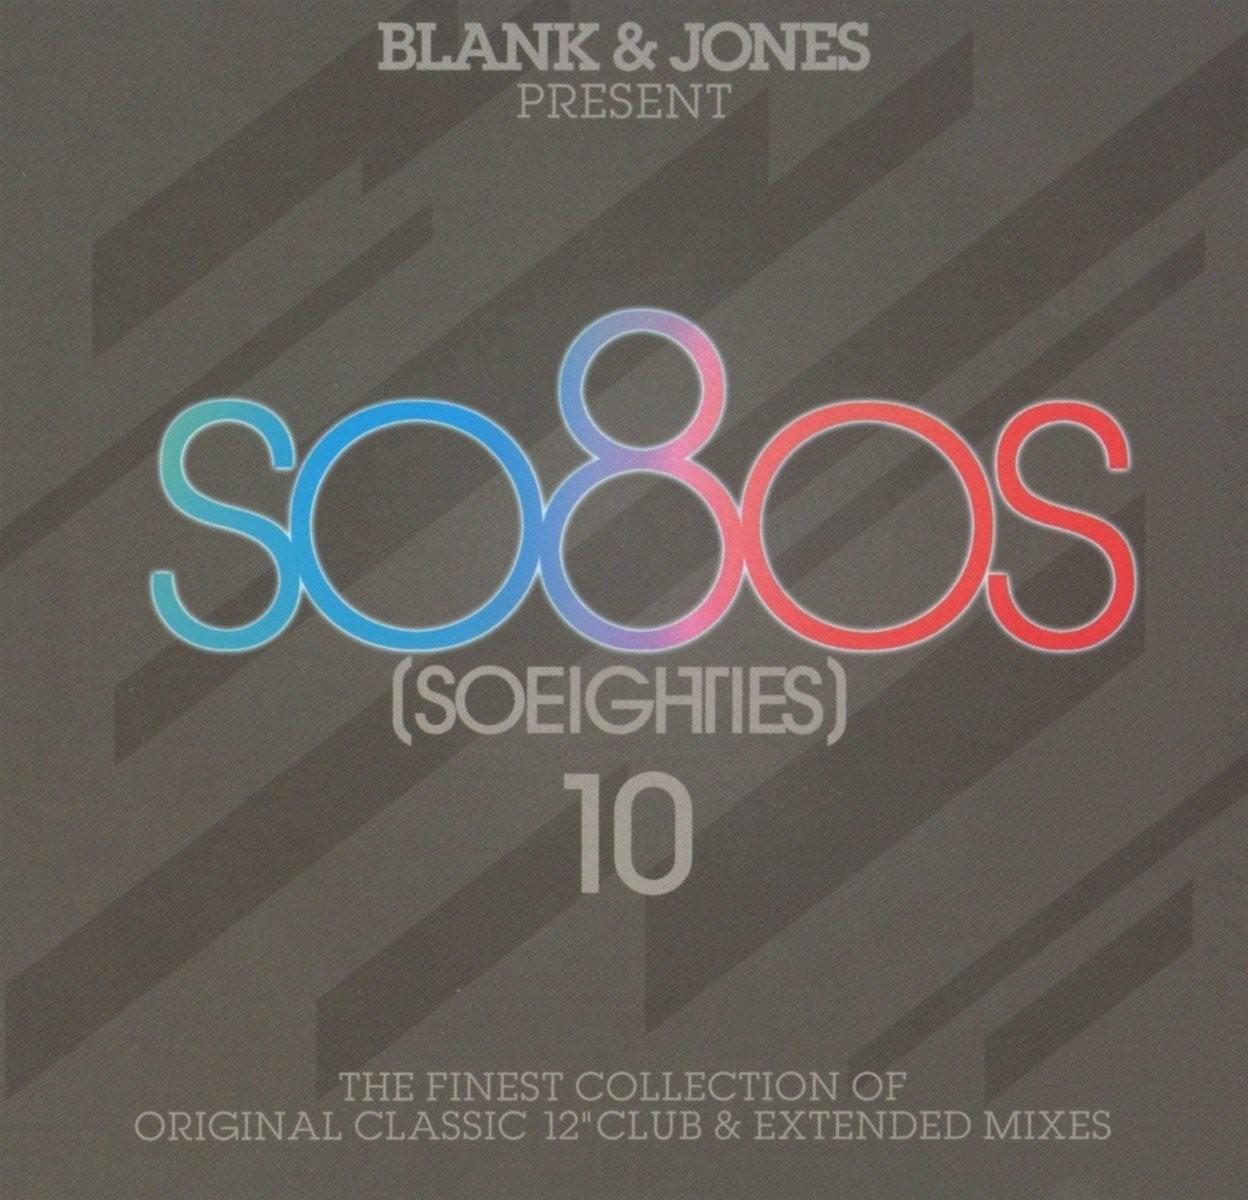 Blank Amp Jones So80s Vol 10 Vinyl Masterpiece